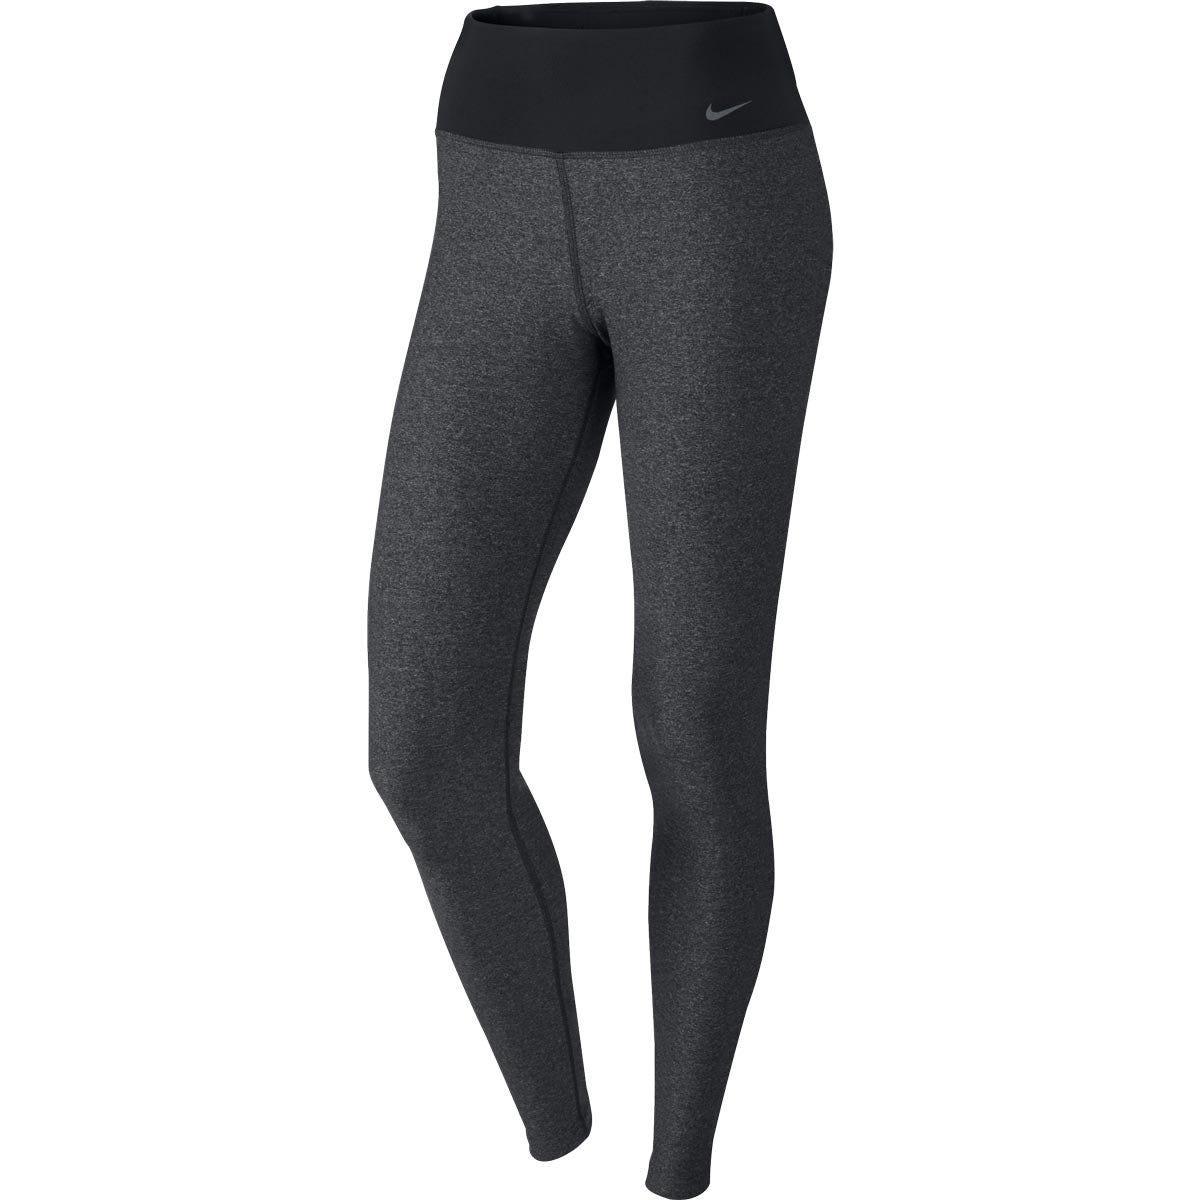 Nike Gray/Black Legend 2.0 Softball Training Pants - Womens Size XS